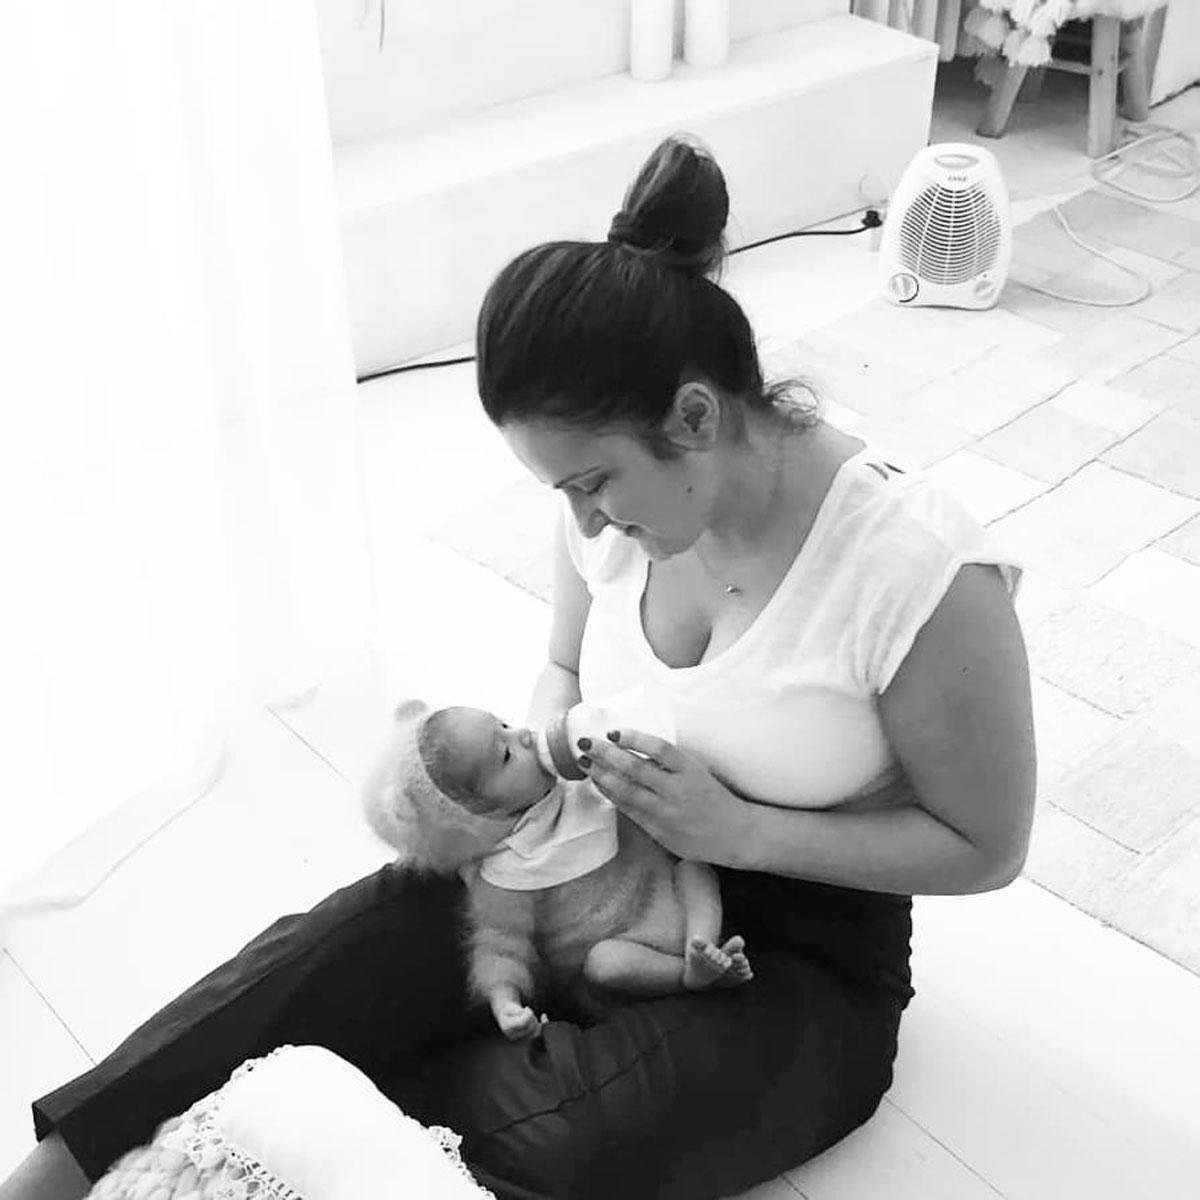 Nicoleta Raftu maternity and new born photographer for workshops by Carmen Bergmann Studio feeding the new born in preparation for shooting